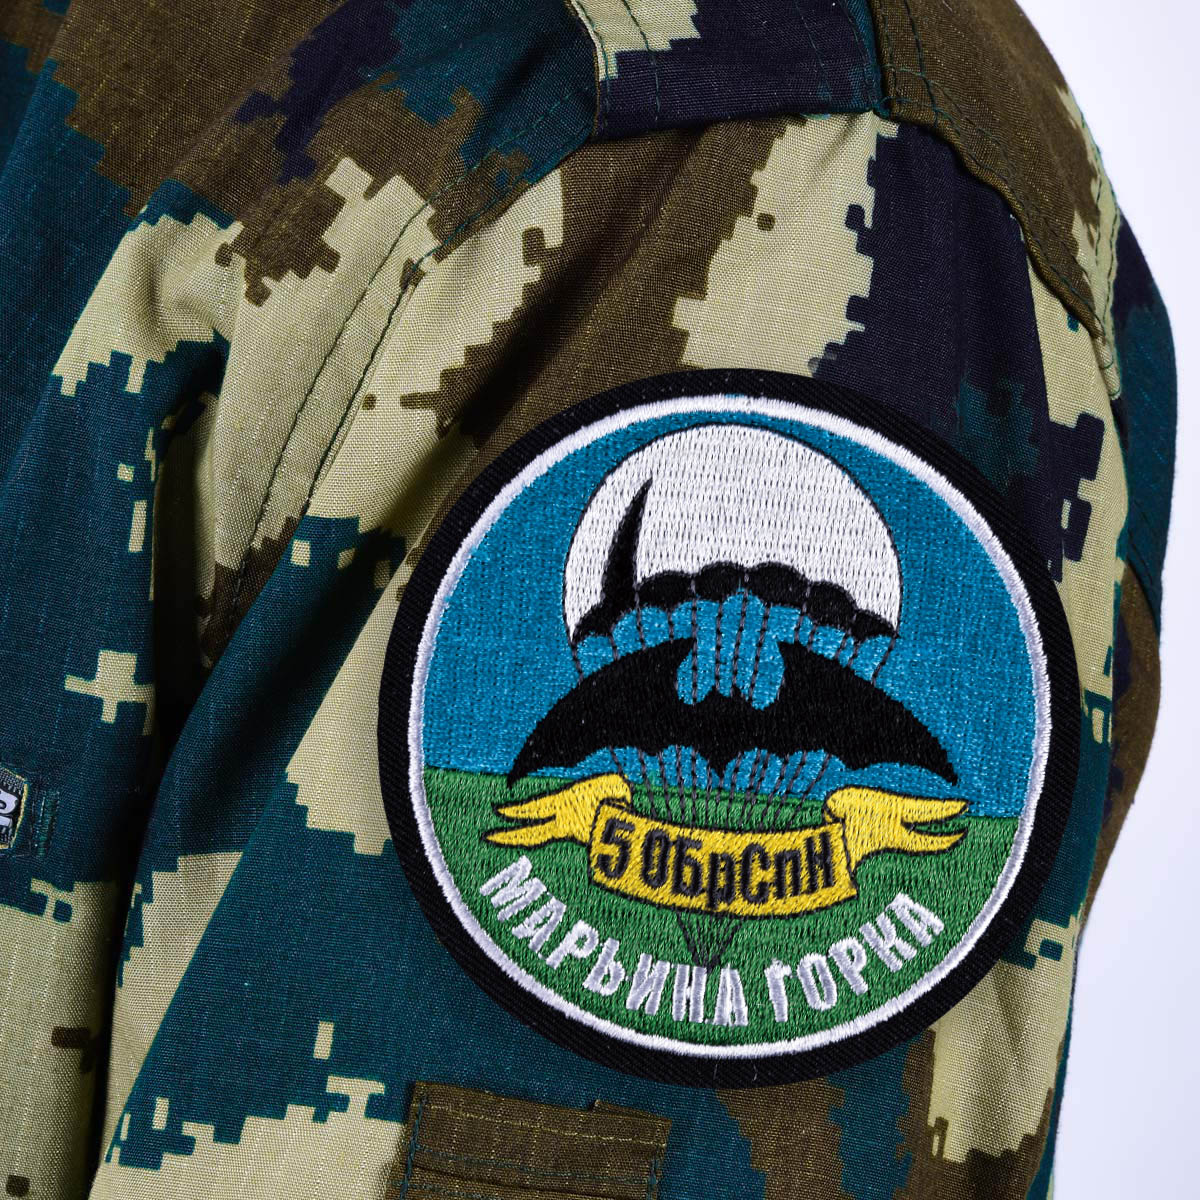 Шеврон спецназа ГРУ 5 ОБрСпН Марьина Горка